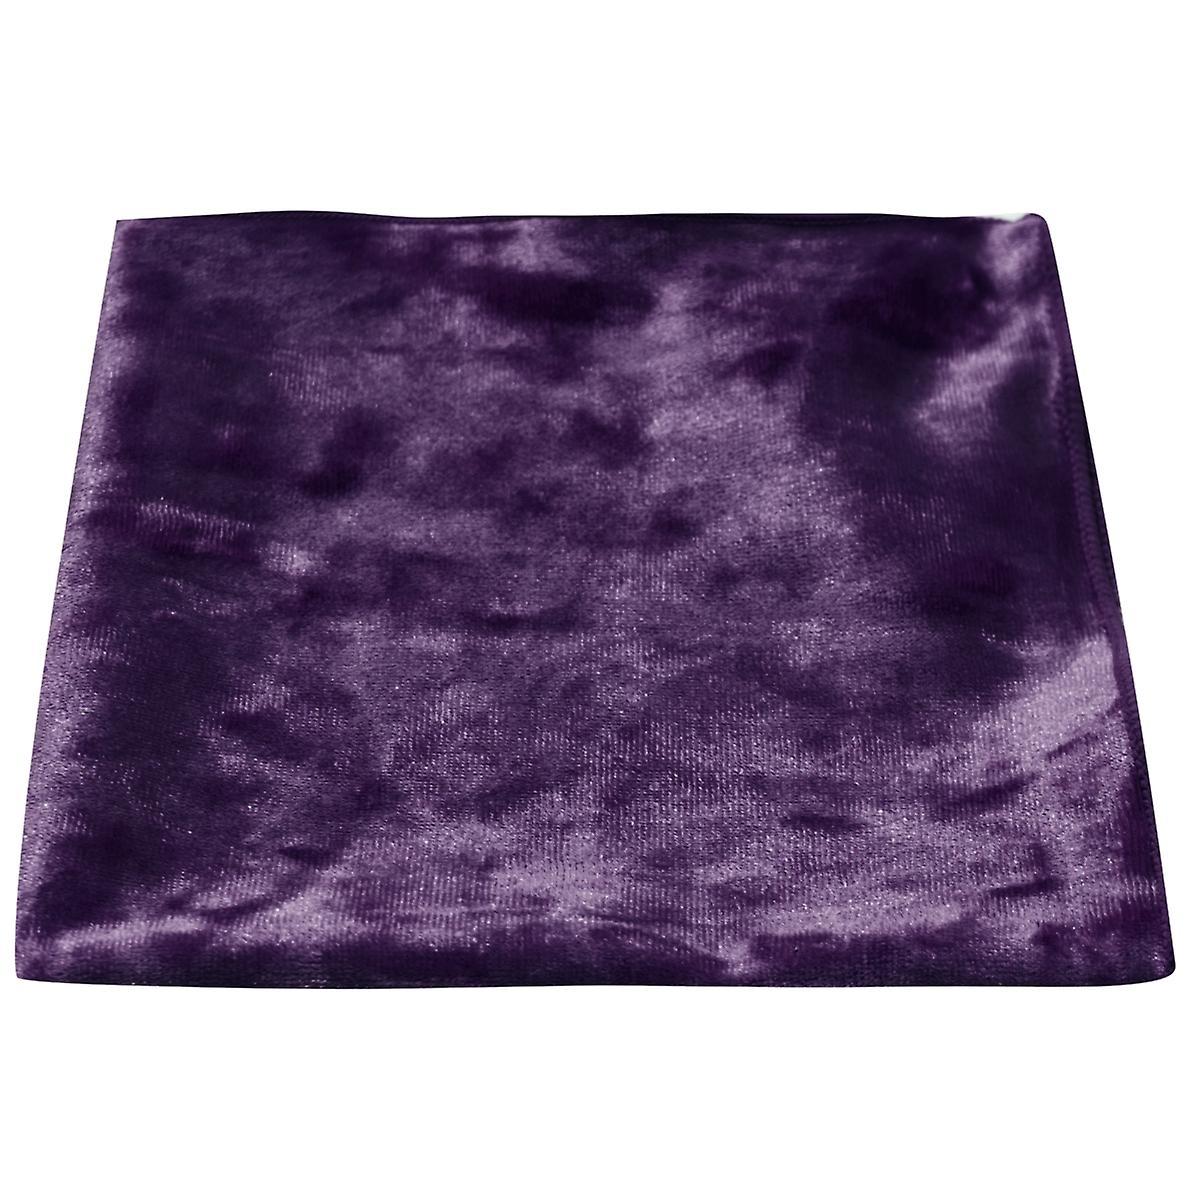 Luxury Purple Crushed Velvet Pocket Square, Handkerchief